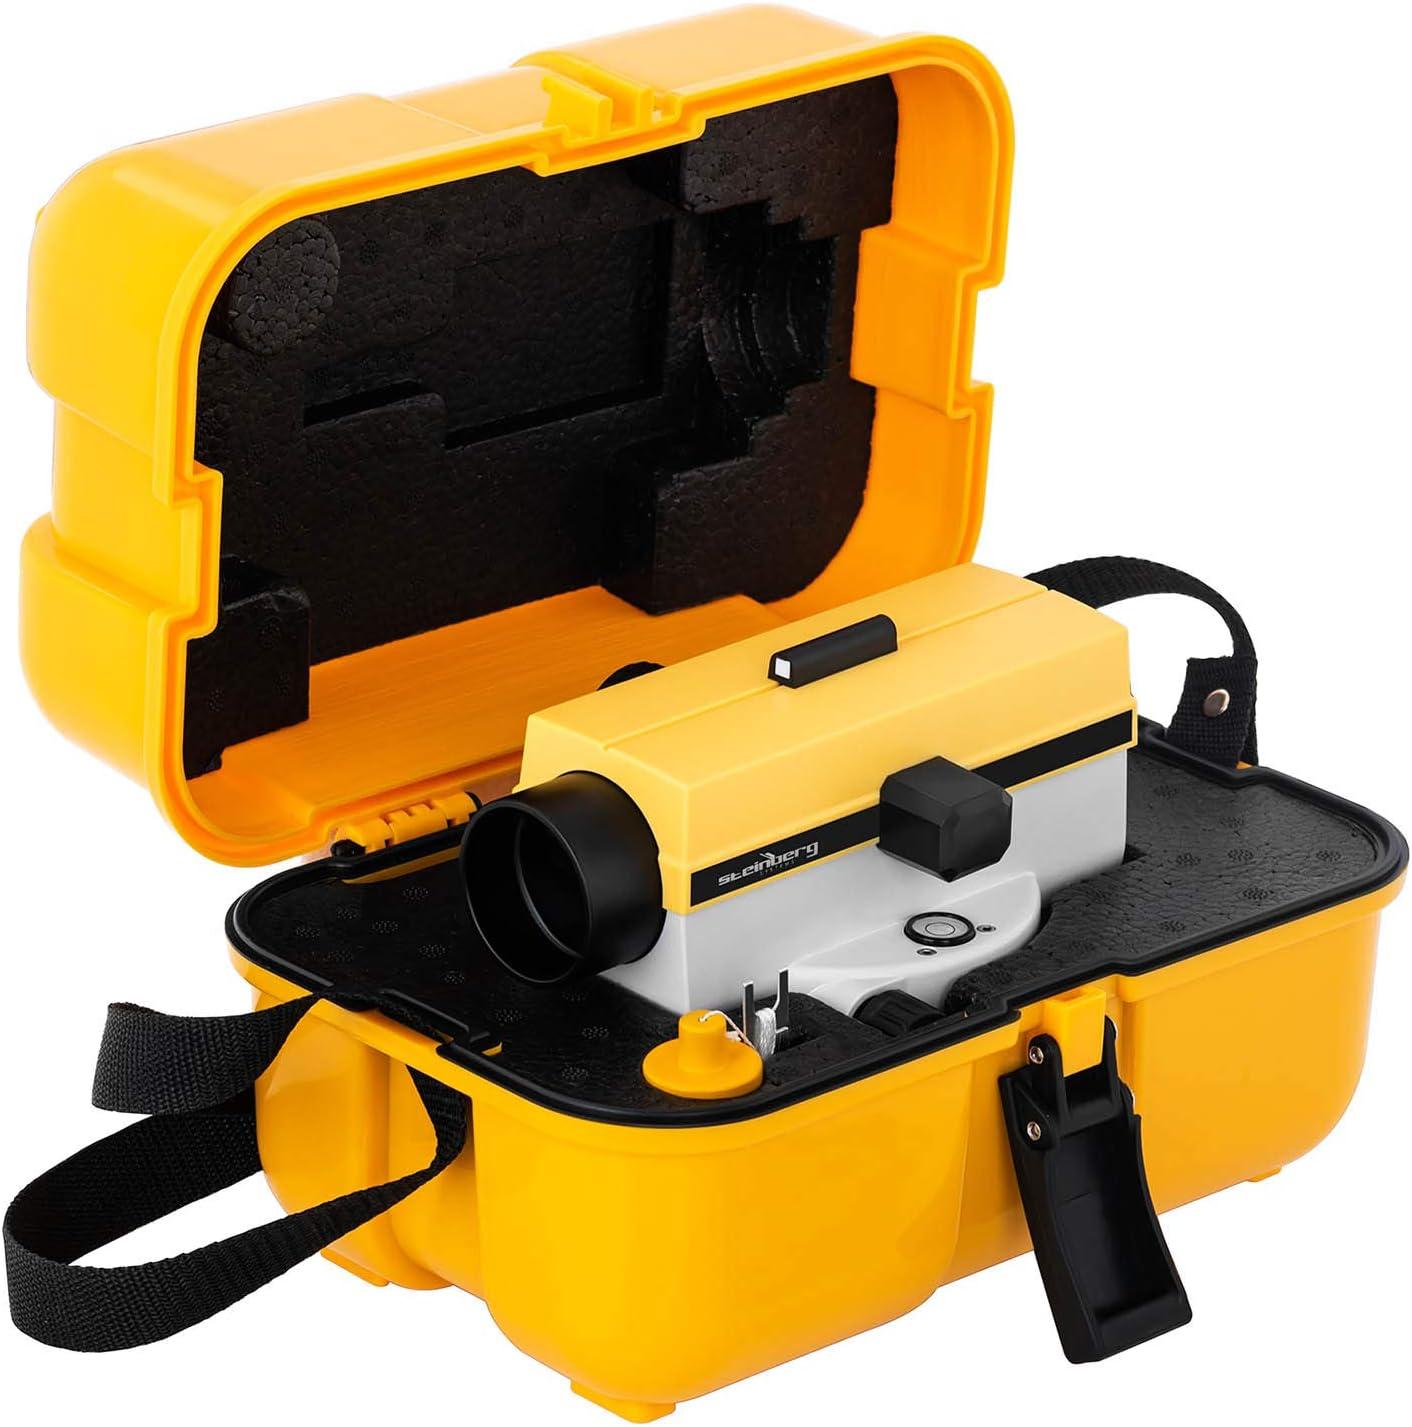 Con tr/ípode y mira, 24 aumentos, Lente 36 mm, Desviaci/ón 2 mm, Compensador amortiguado por aire Steinberg Systems Nivel /Óptico Para Topograf/ía SBS-LIS-24//36